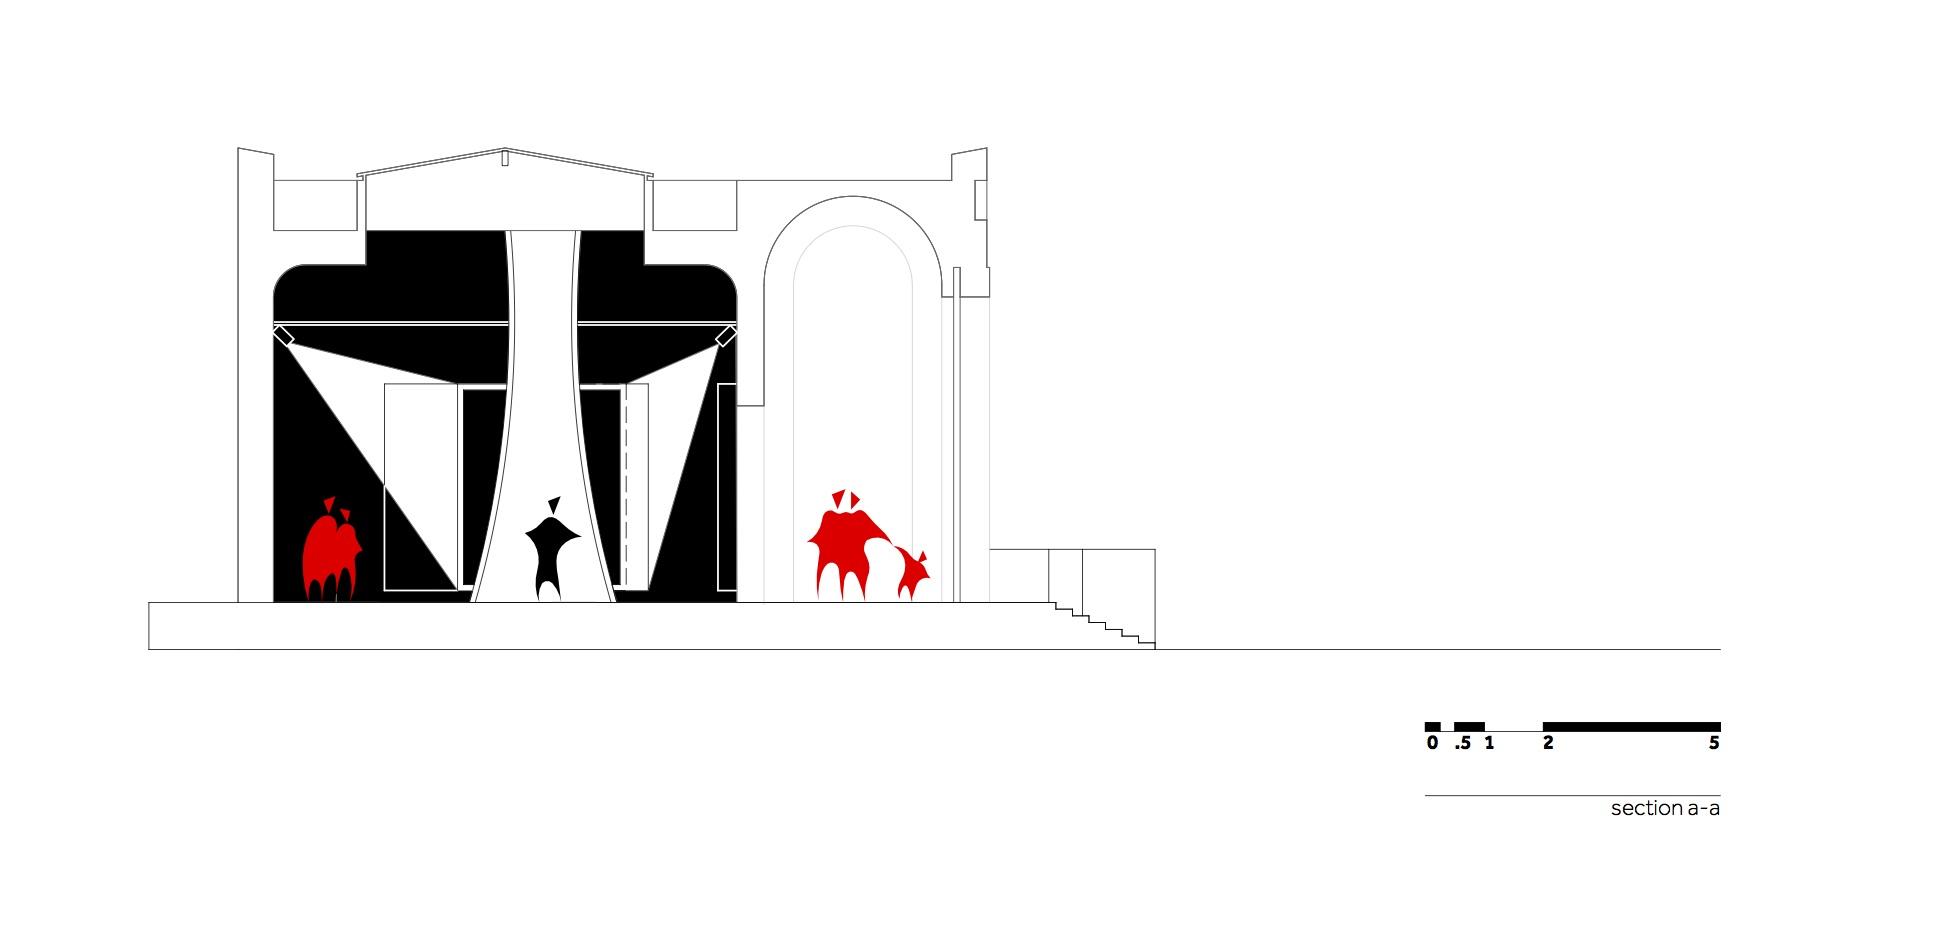 MHS - Bienala de la Venetia - W.03 Sectiune a-a_en